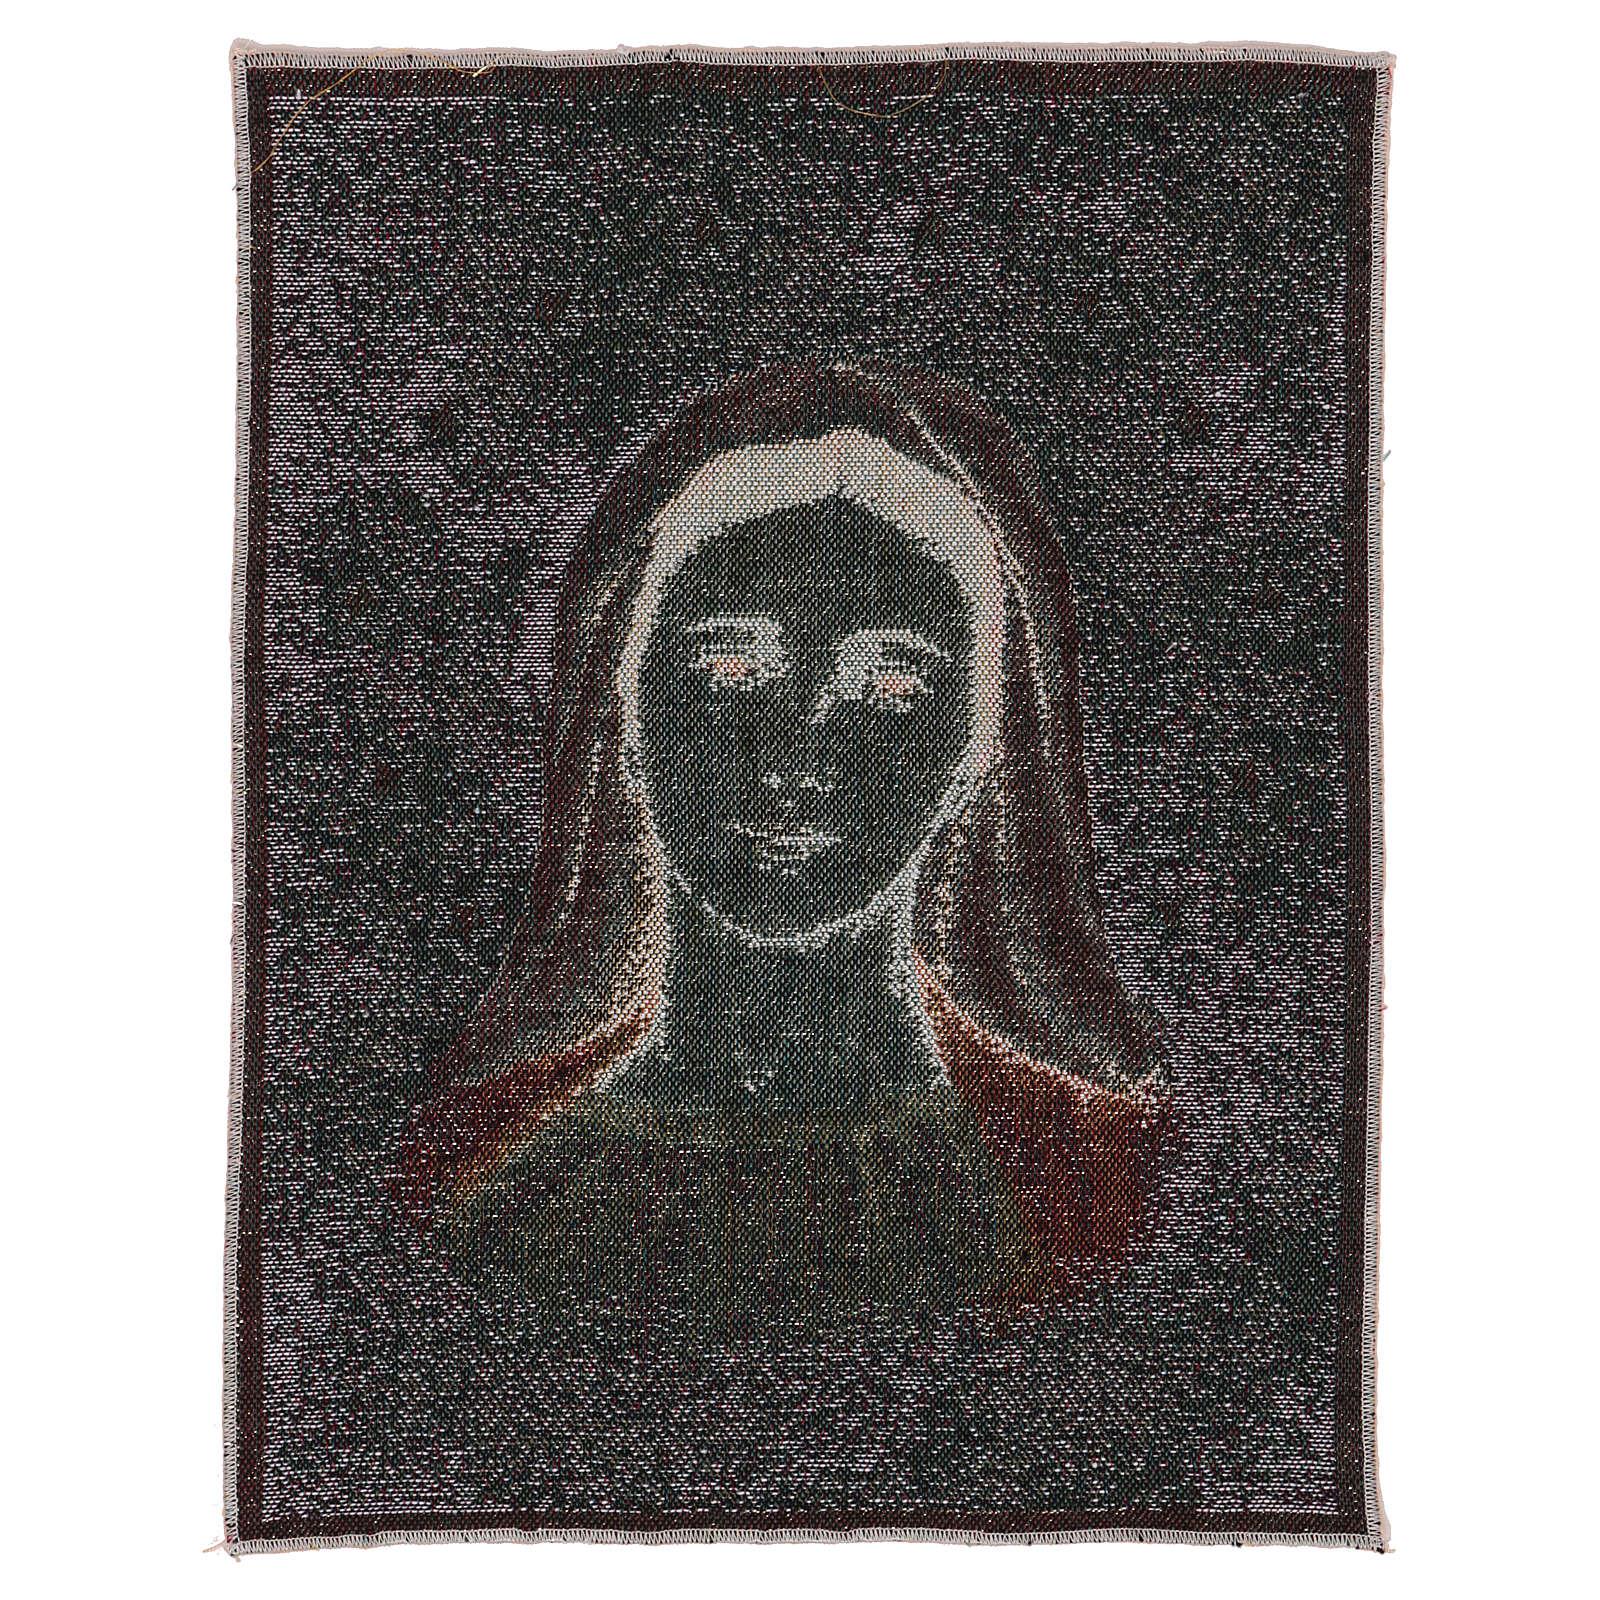 Tapiz Virgen de Medjugorje con Estrellas 40x30 cm 3